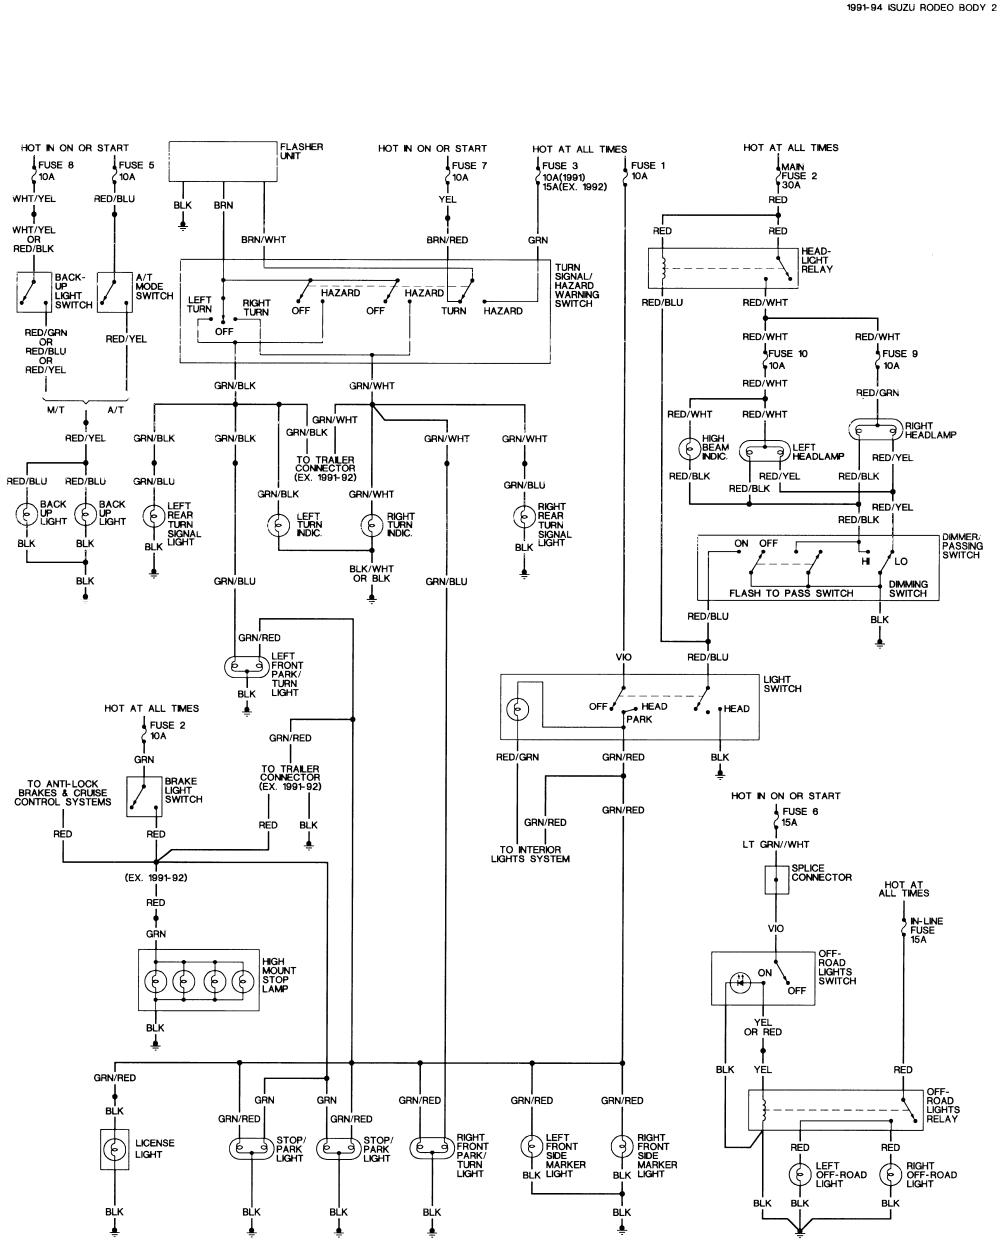 2002 isuzu trooper wiring diagram free picture